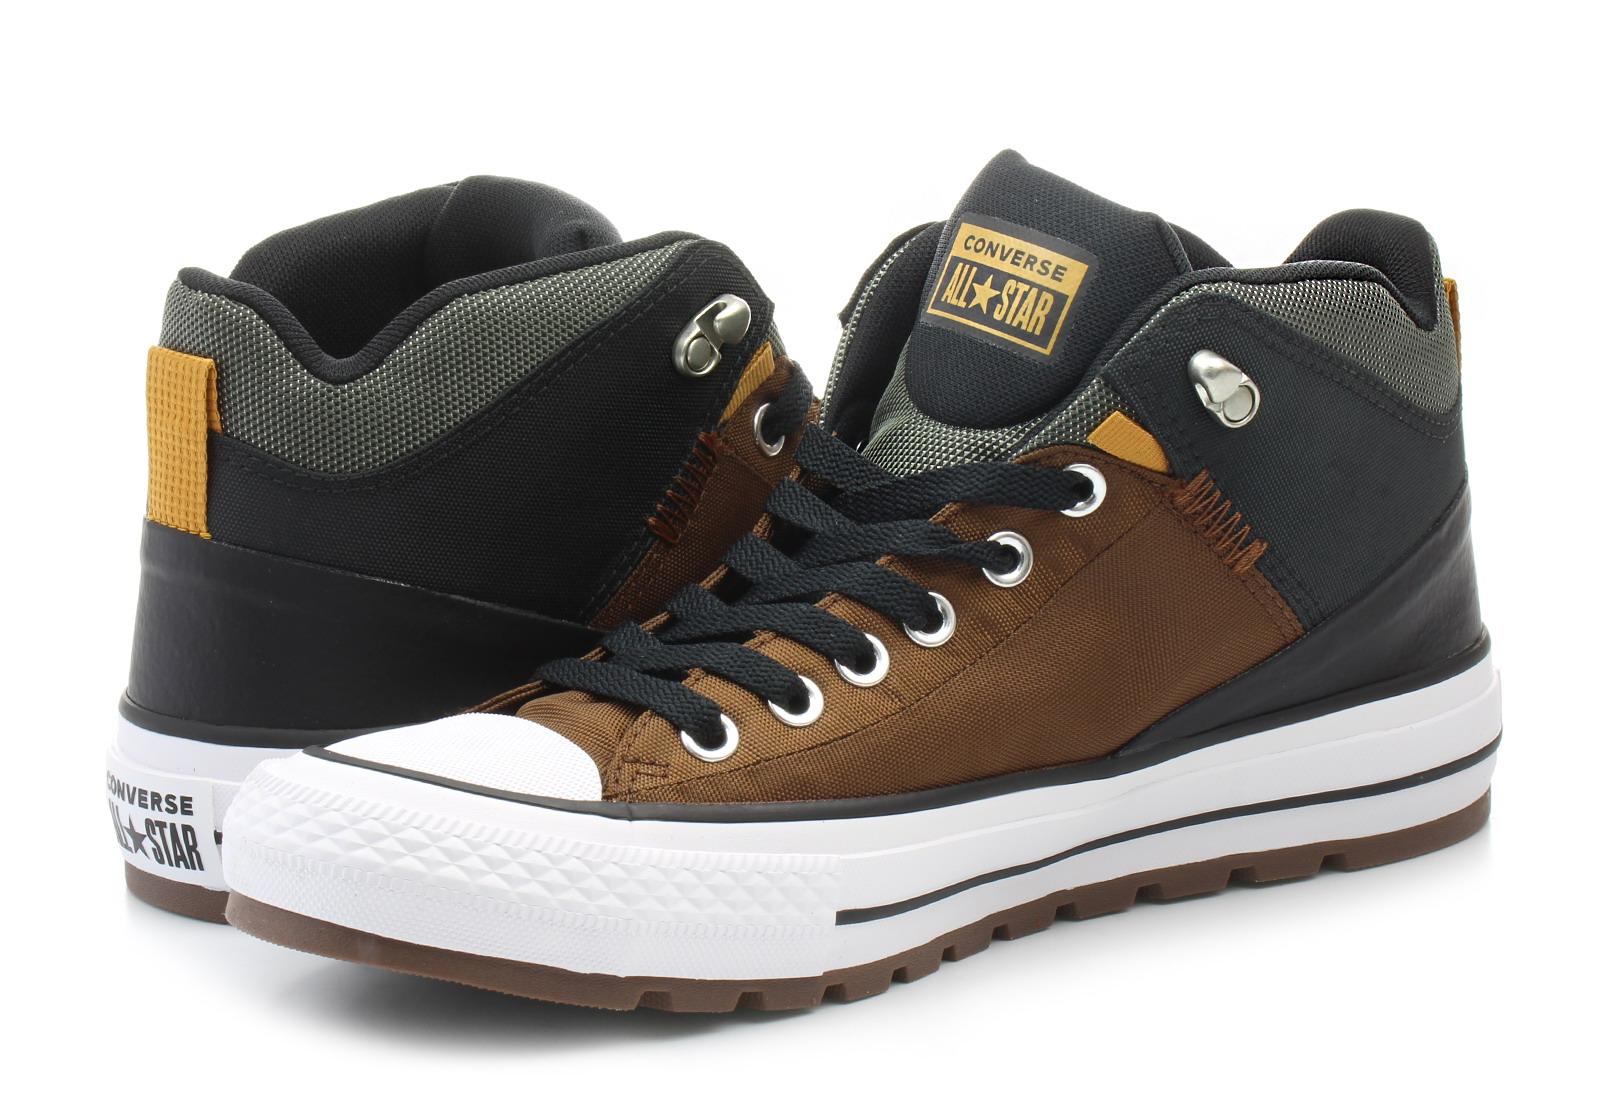 cf907006346b Converse Sneakers - Chuck Taylor All Star Street Boot Hi - 161469C ...